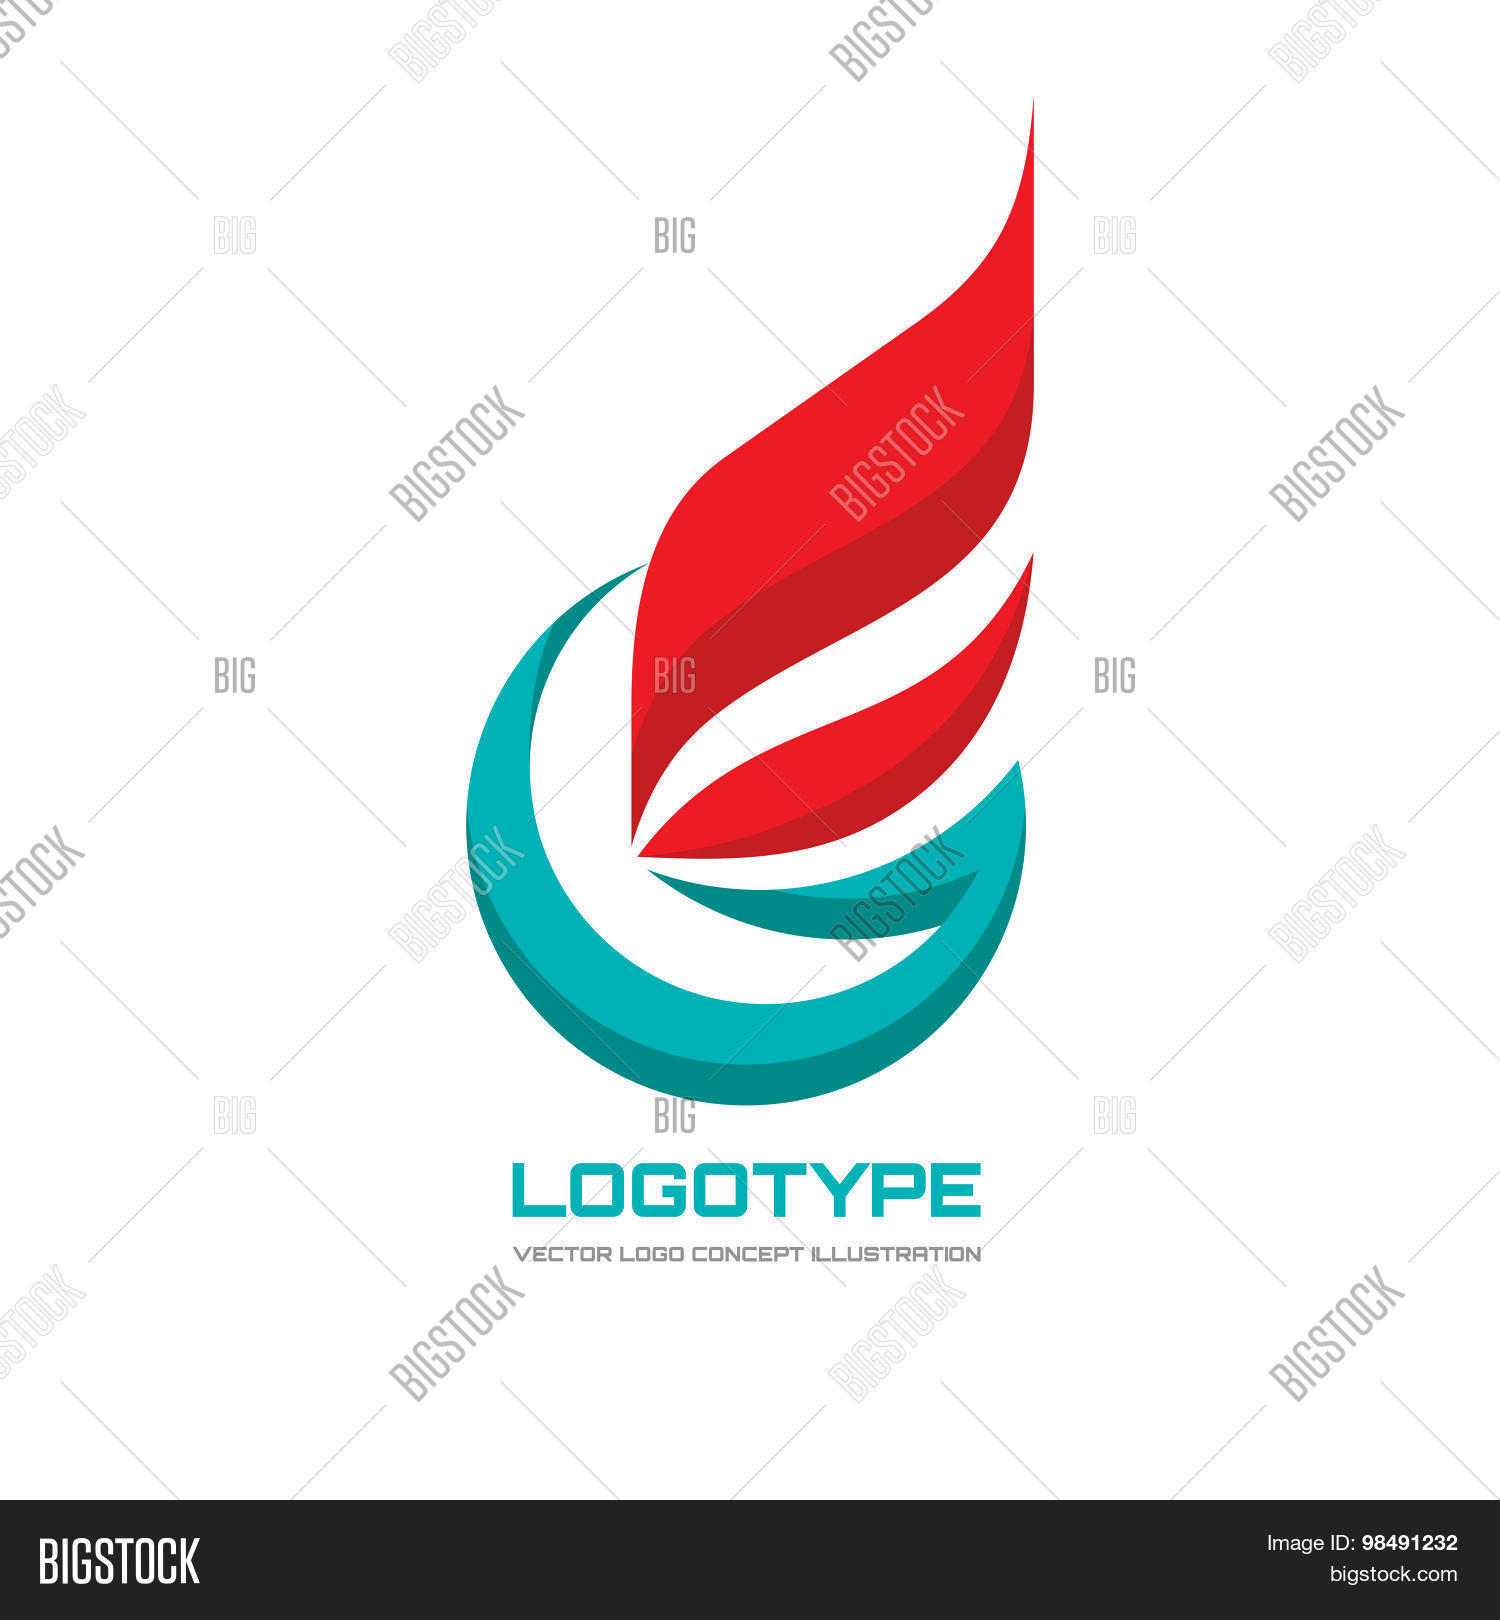 Abstract Vector Logo Vector & Photo (Free Trial) | Bigstock